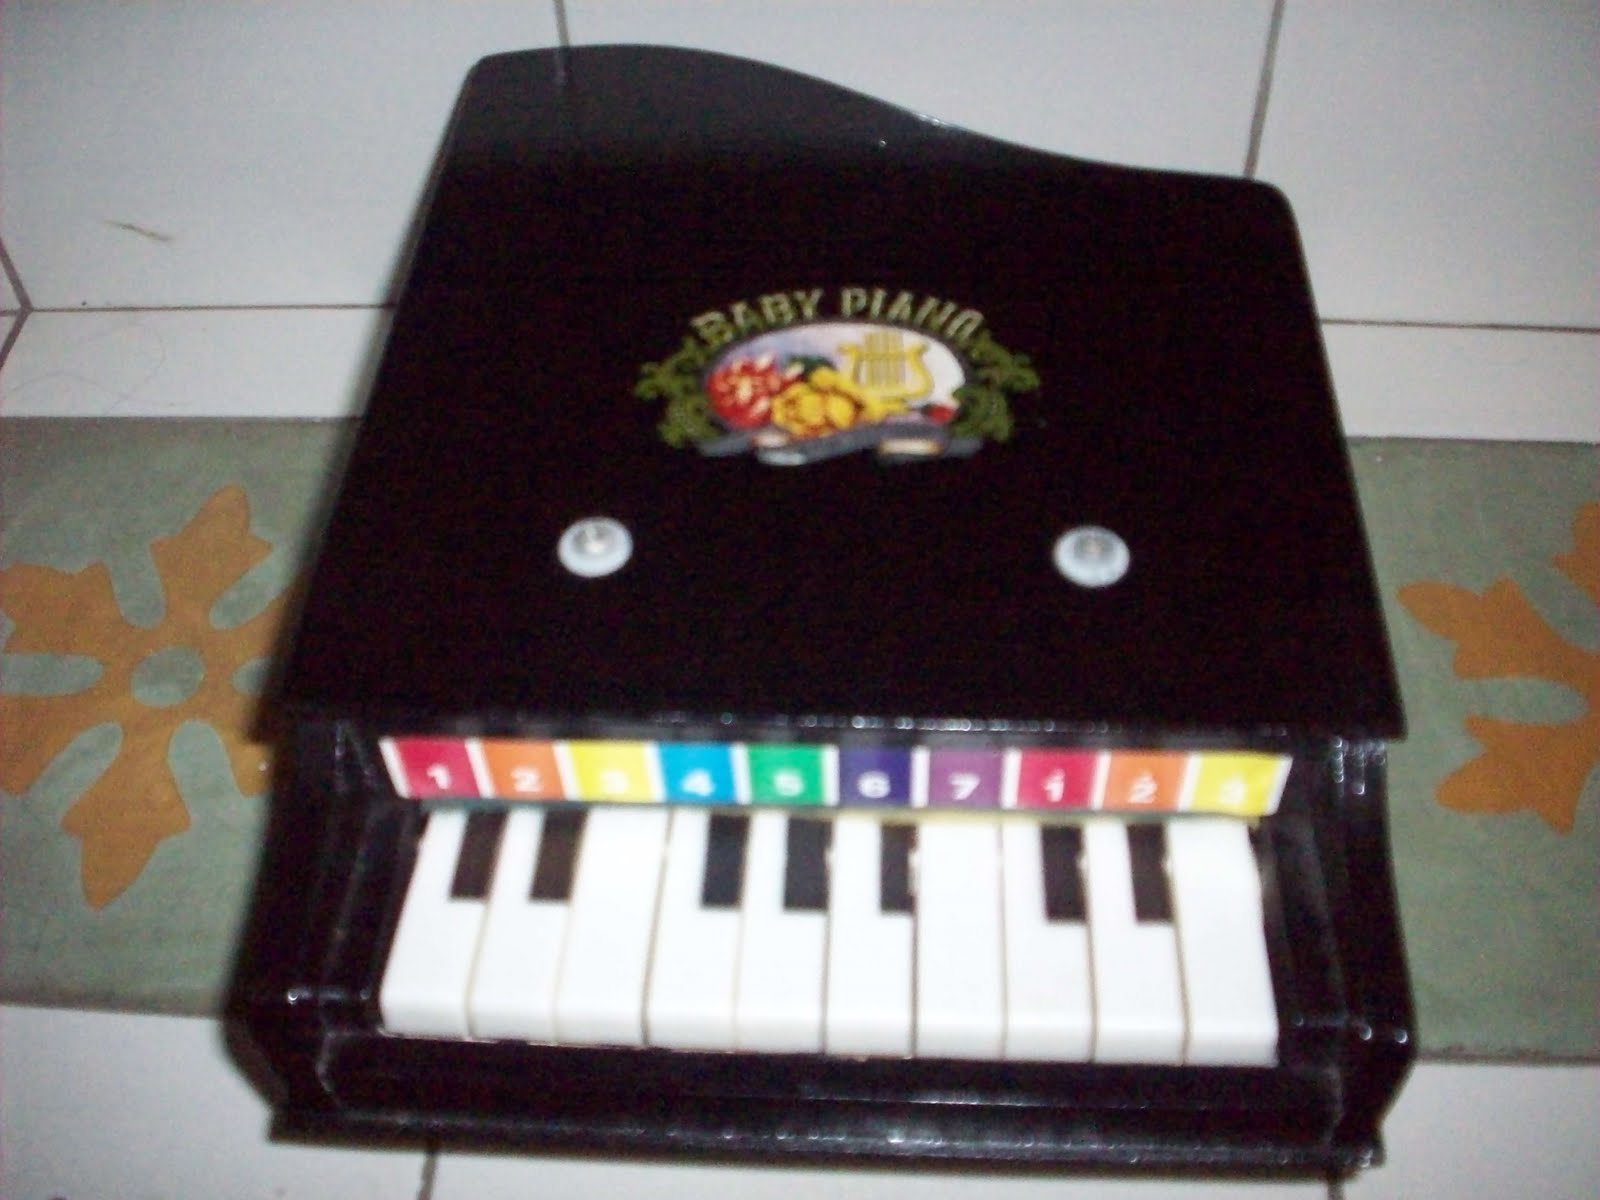 yang ni lak piano kayu jenama baby piano ade warne itam merah ngan biru muda piano ni siap ade kaki lagi hehe